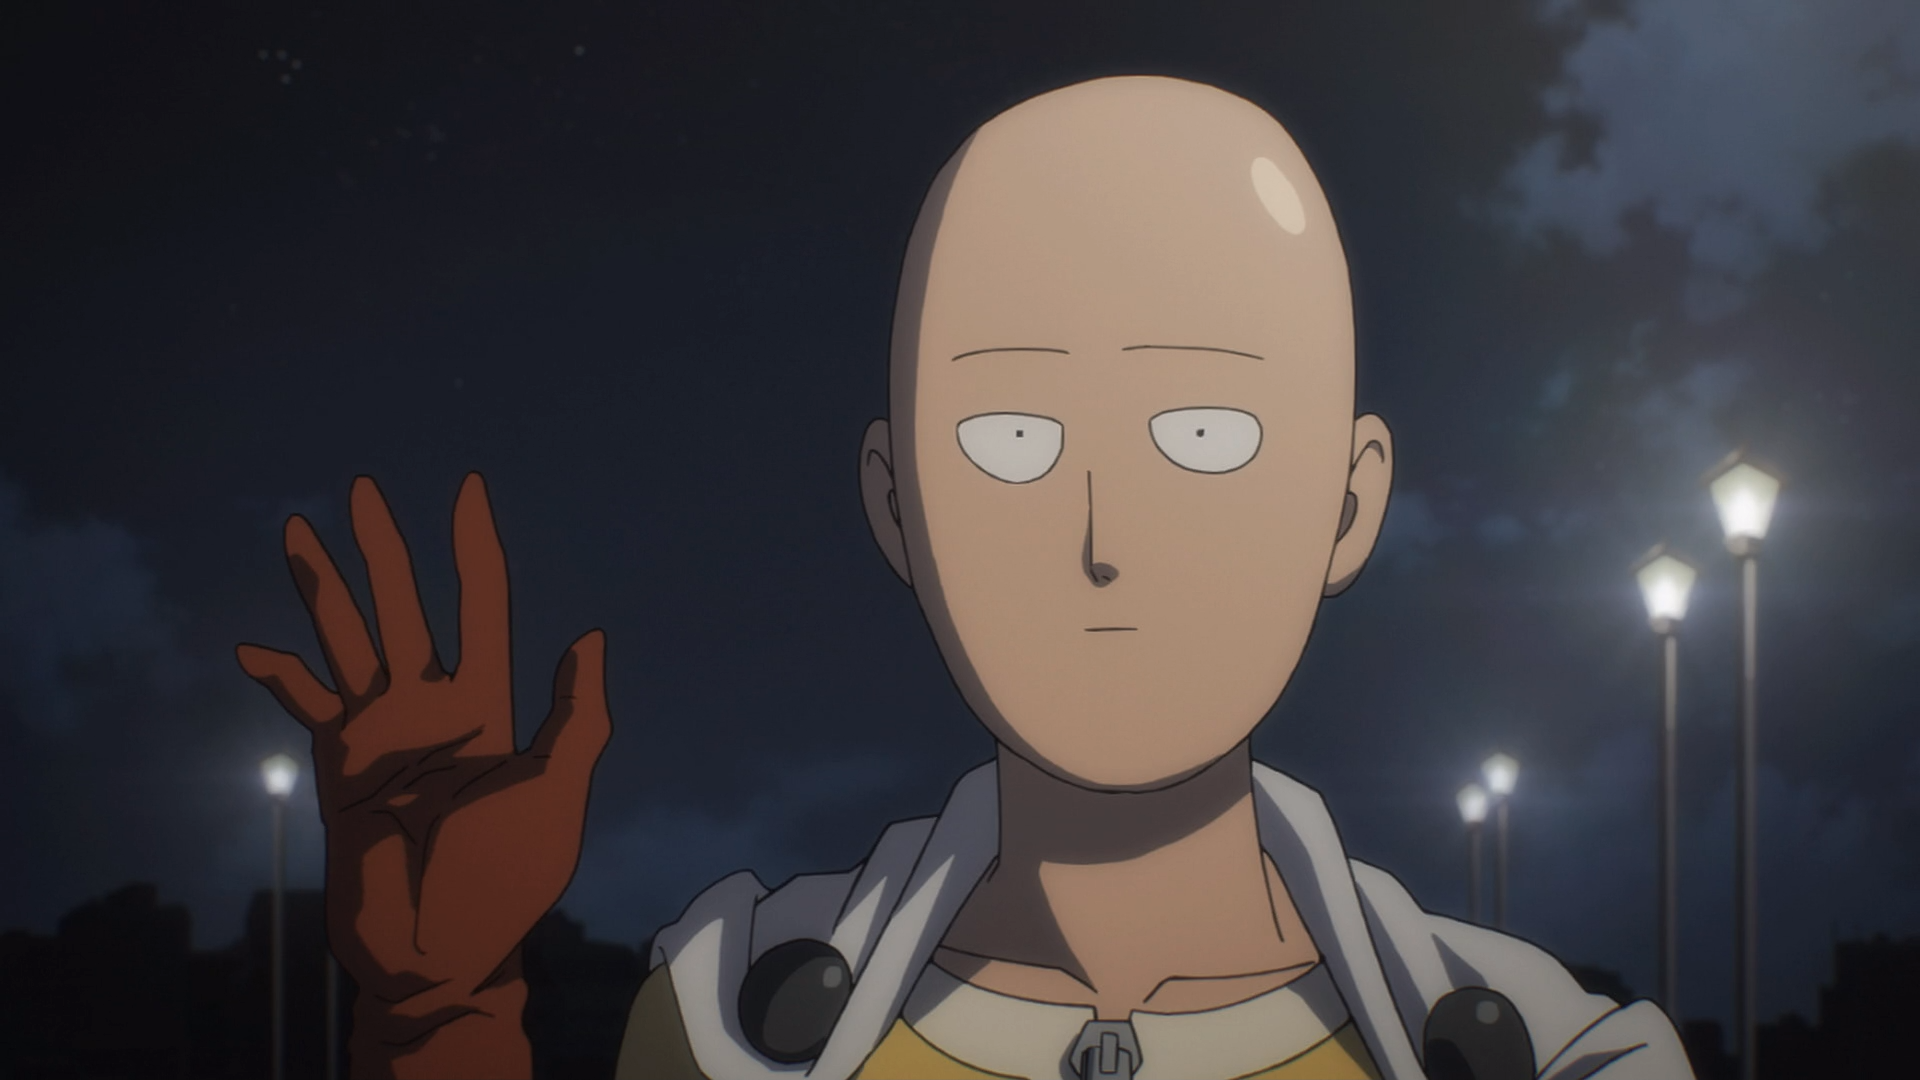 Banjo's Top 10 Fall 2015 Anime